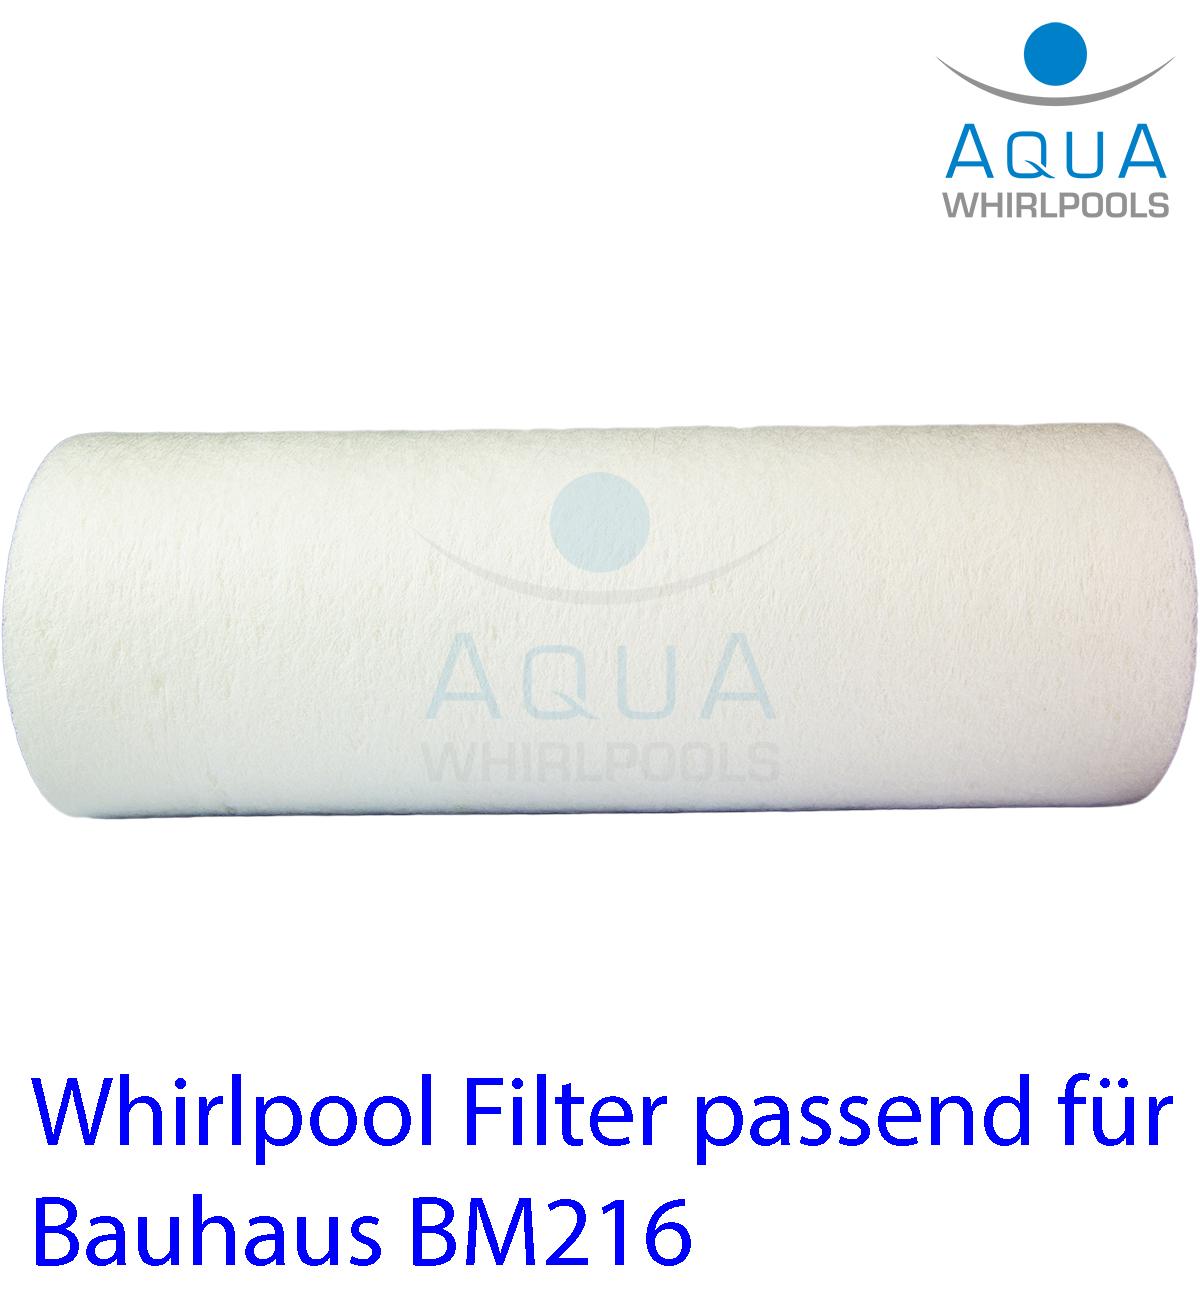 Whirlpool Filter passend für Bauhaus BM216 | Blog | Aqua ...